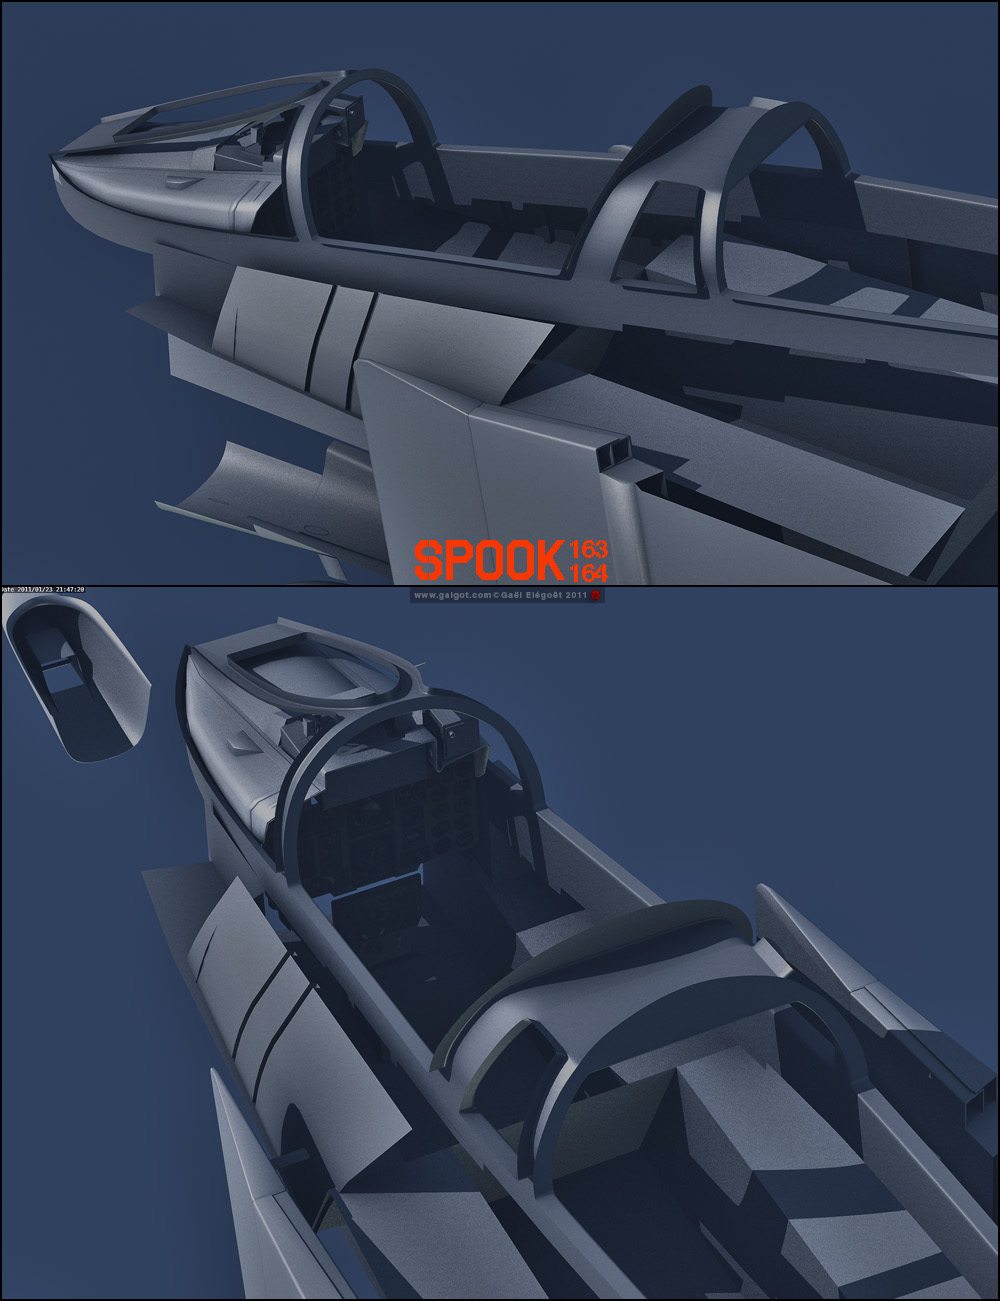 Spook163-164